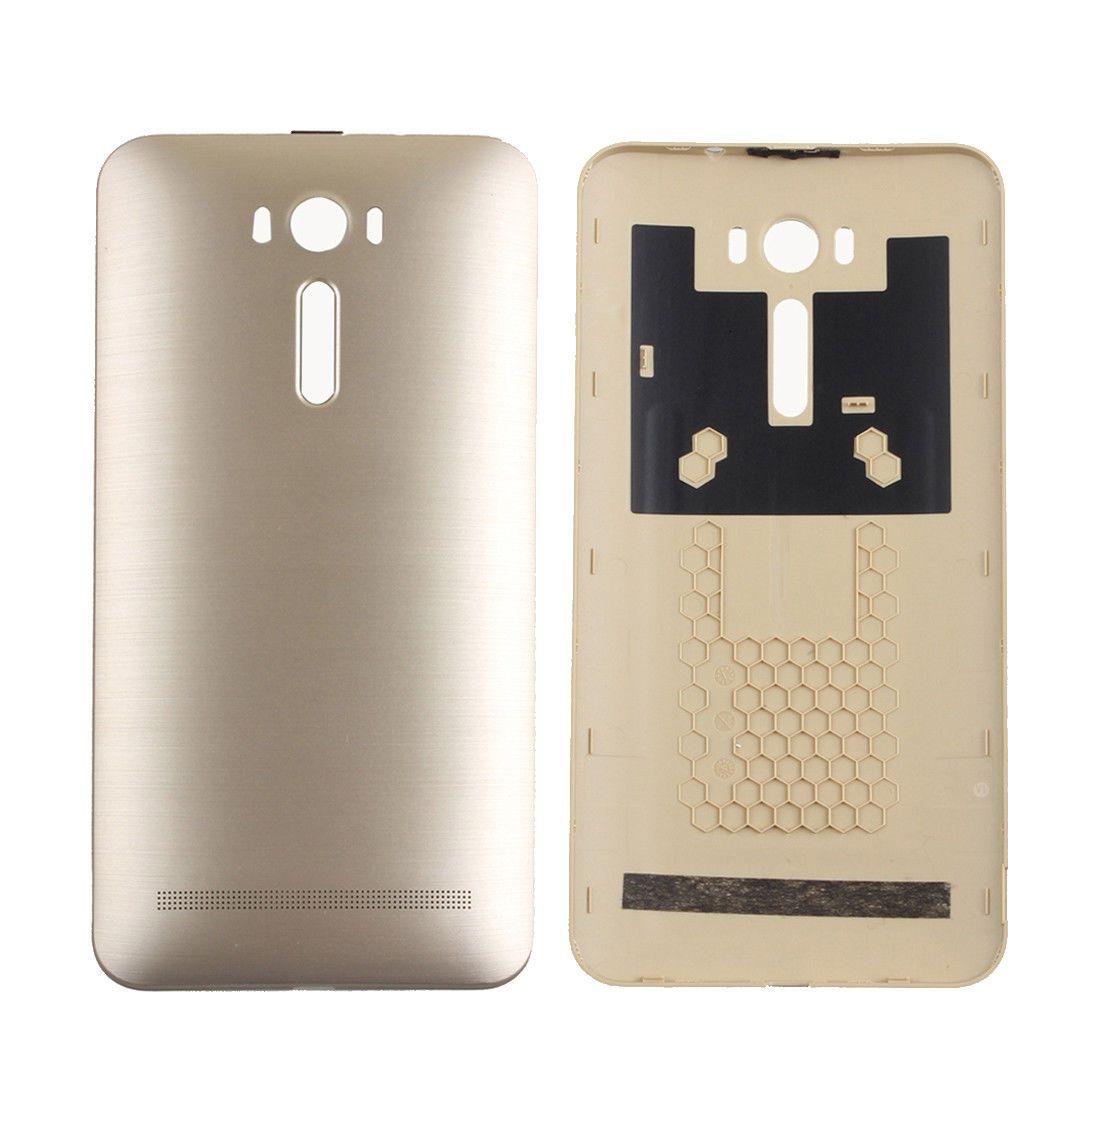 722 Back Battery Door Housing Case Cover For Asus Zenfone 2 Ze601kl Laser Dst6 Ebay Electronics